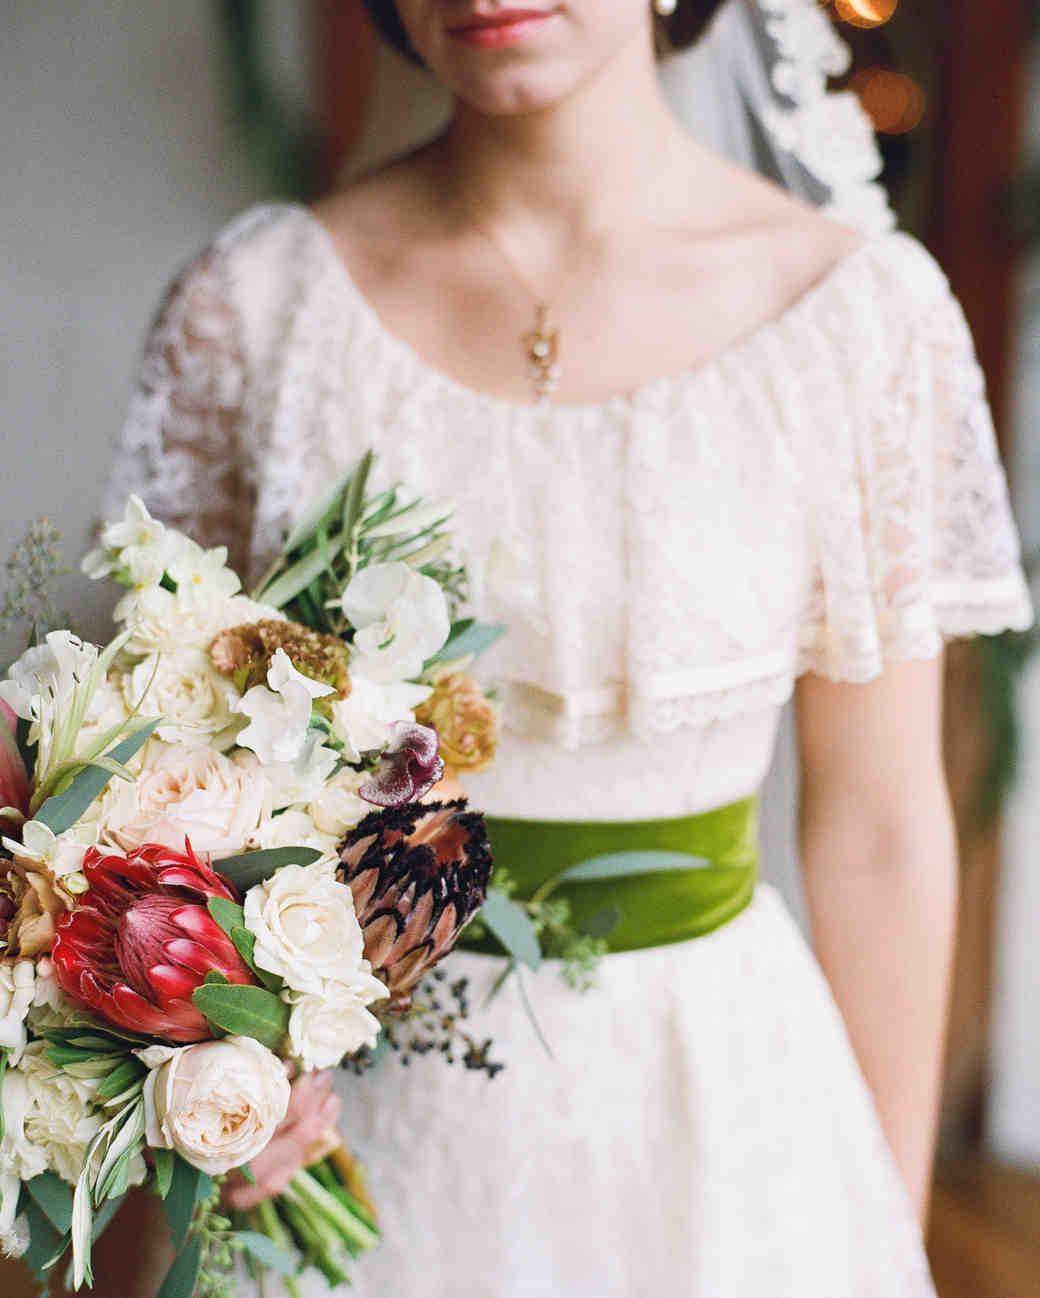 sidney-dane-wedding-sash-124-s112109-0815.jpg